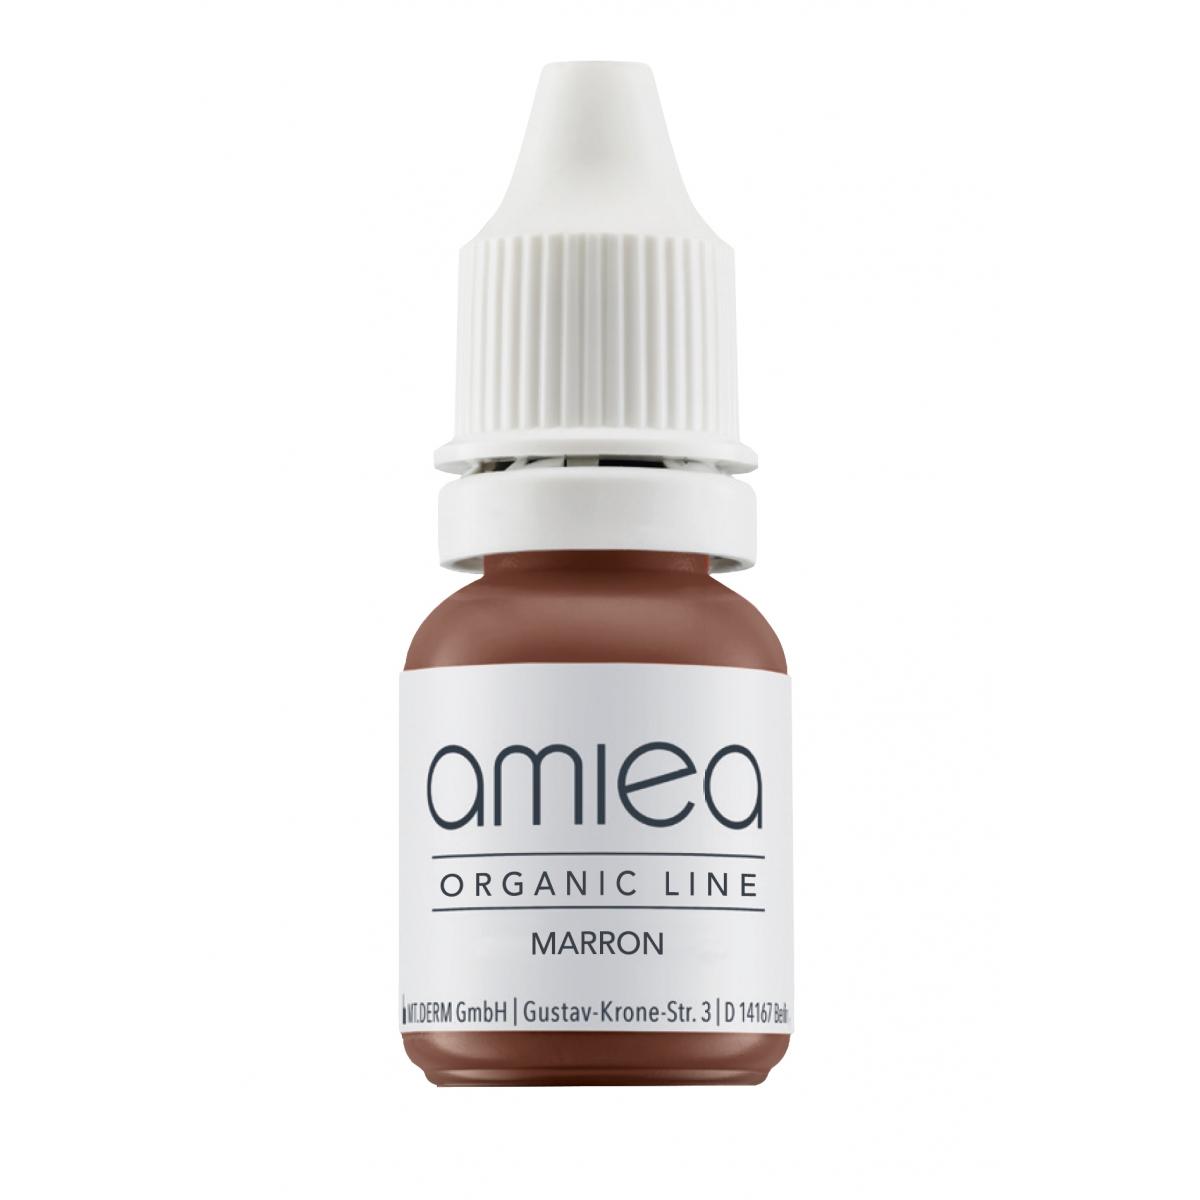 ORGANIC LINE (10ml) - PIGMENT MARRON ORGANICLINE AMIEA (10 ml)